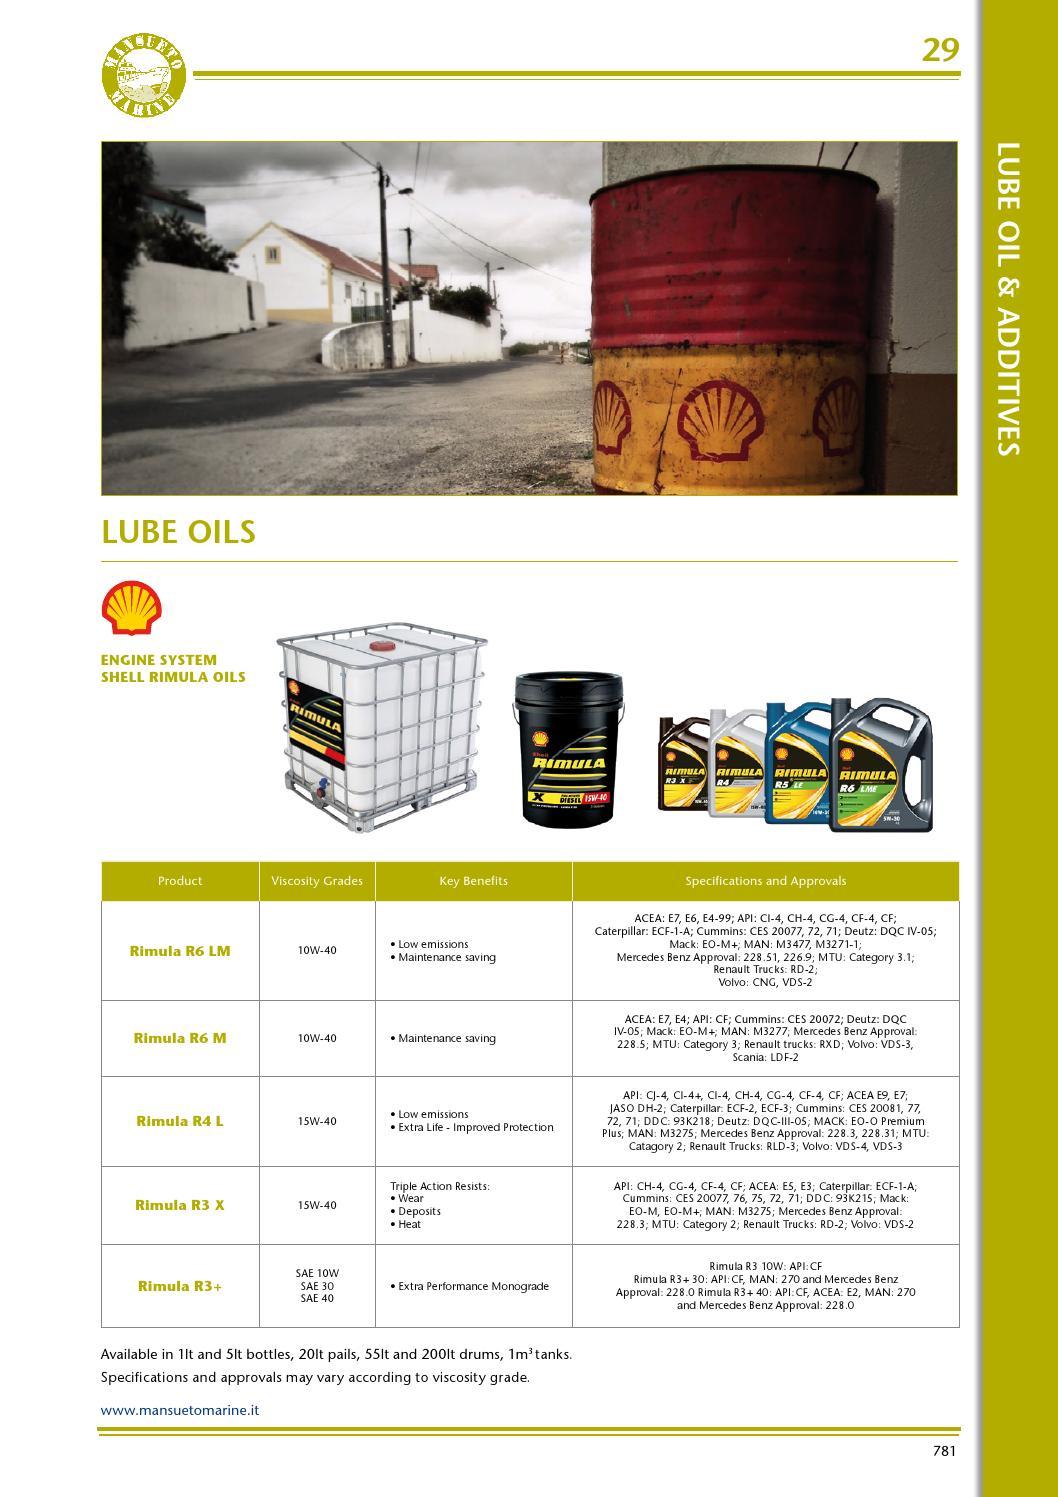 Cms 29 Lube Oil Additives By Luigi Esposito Issuu Mercedes Benz Fuel